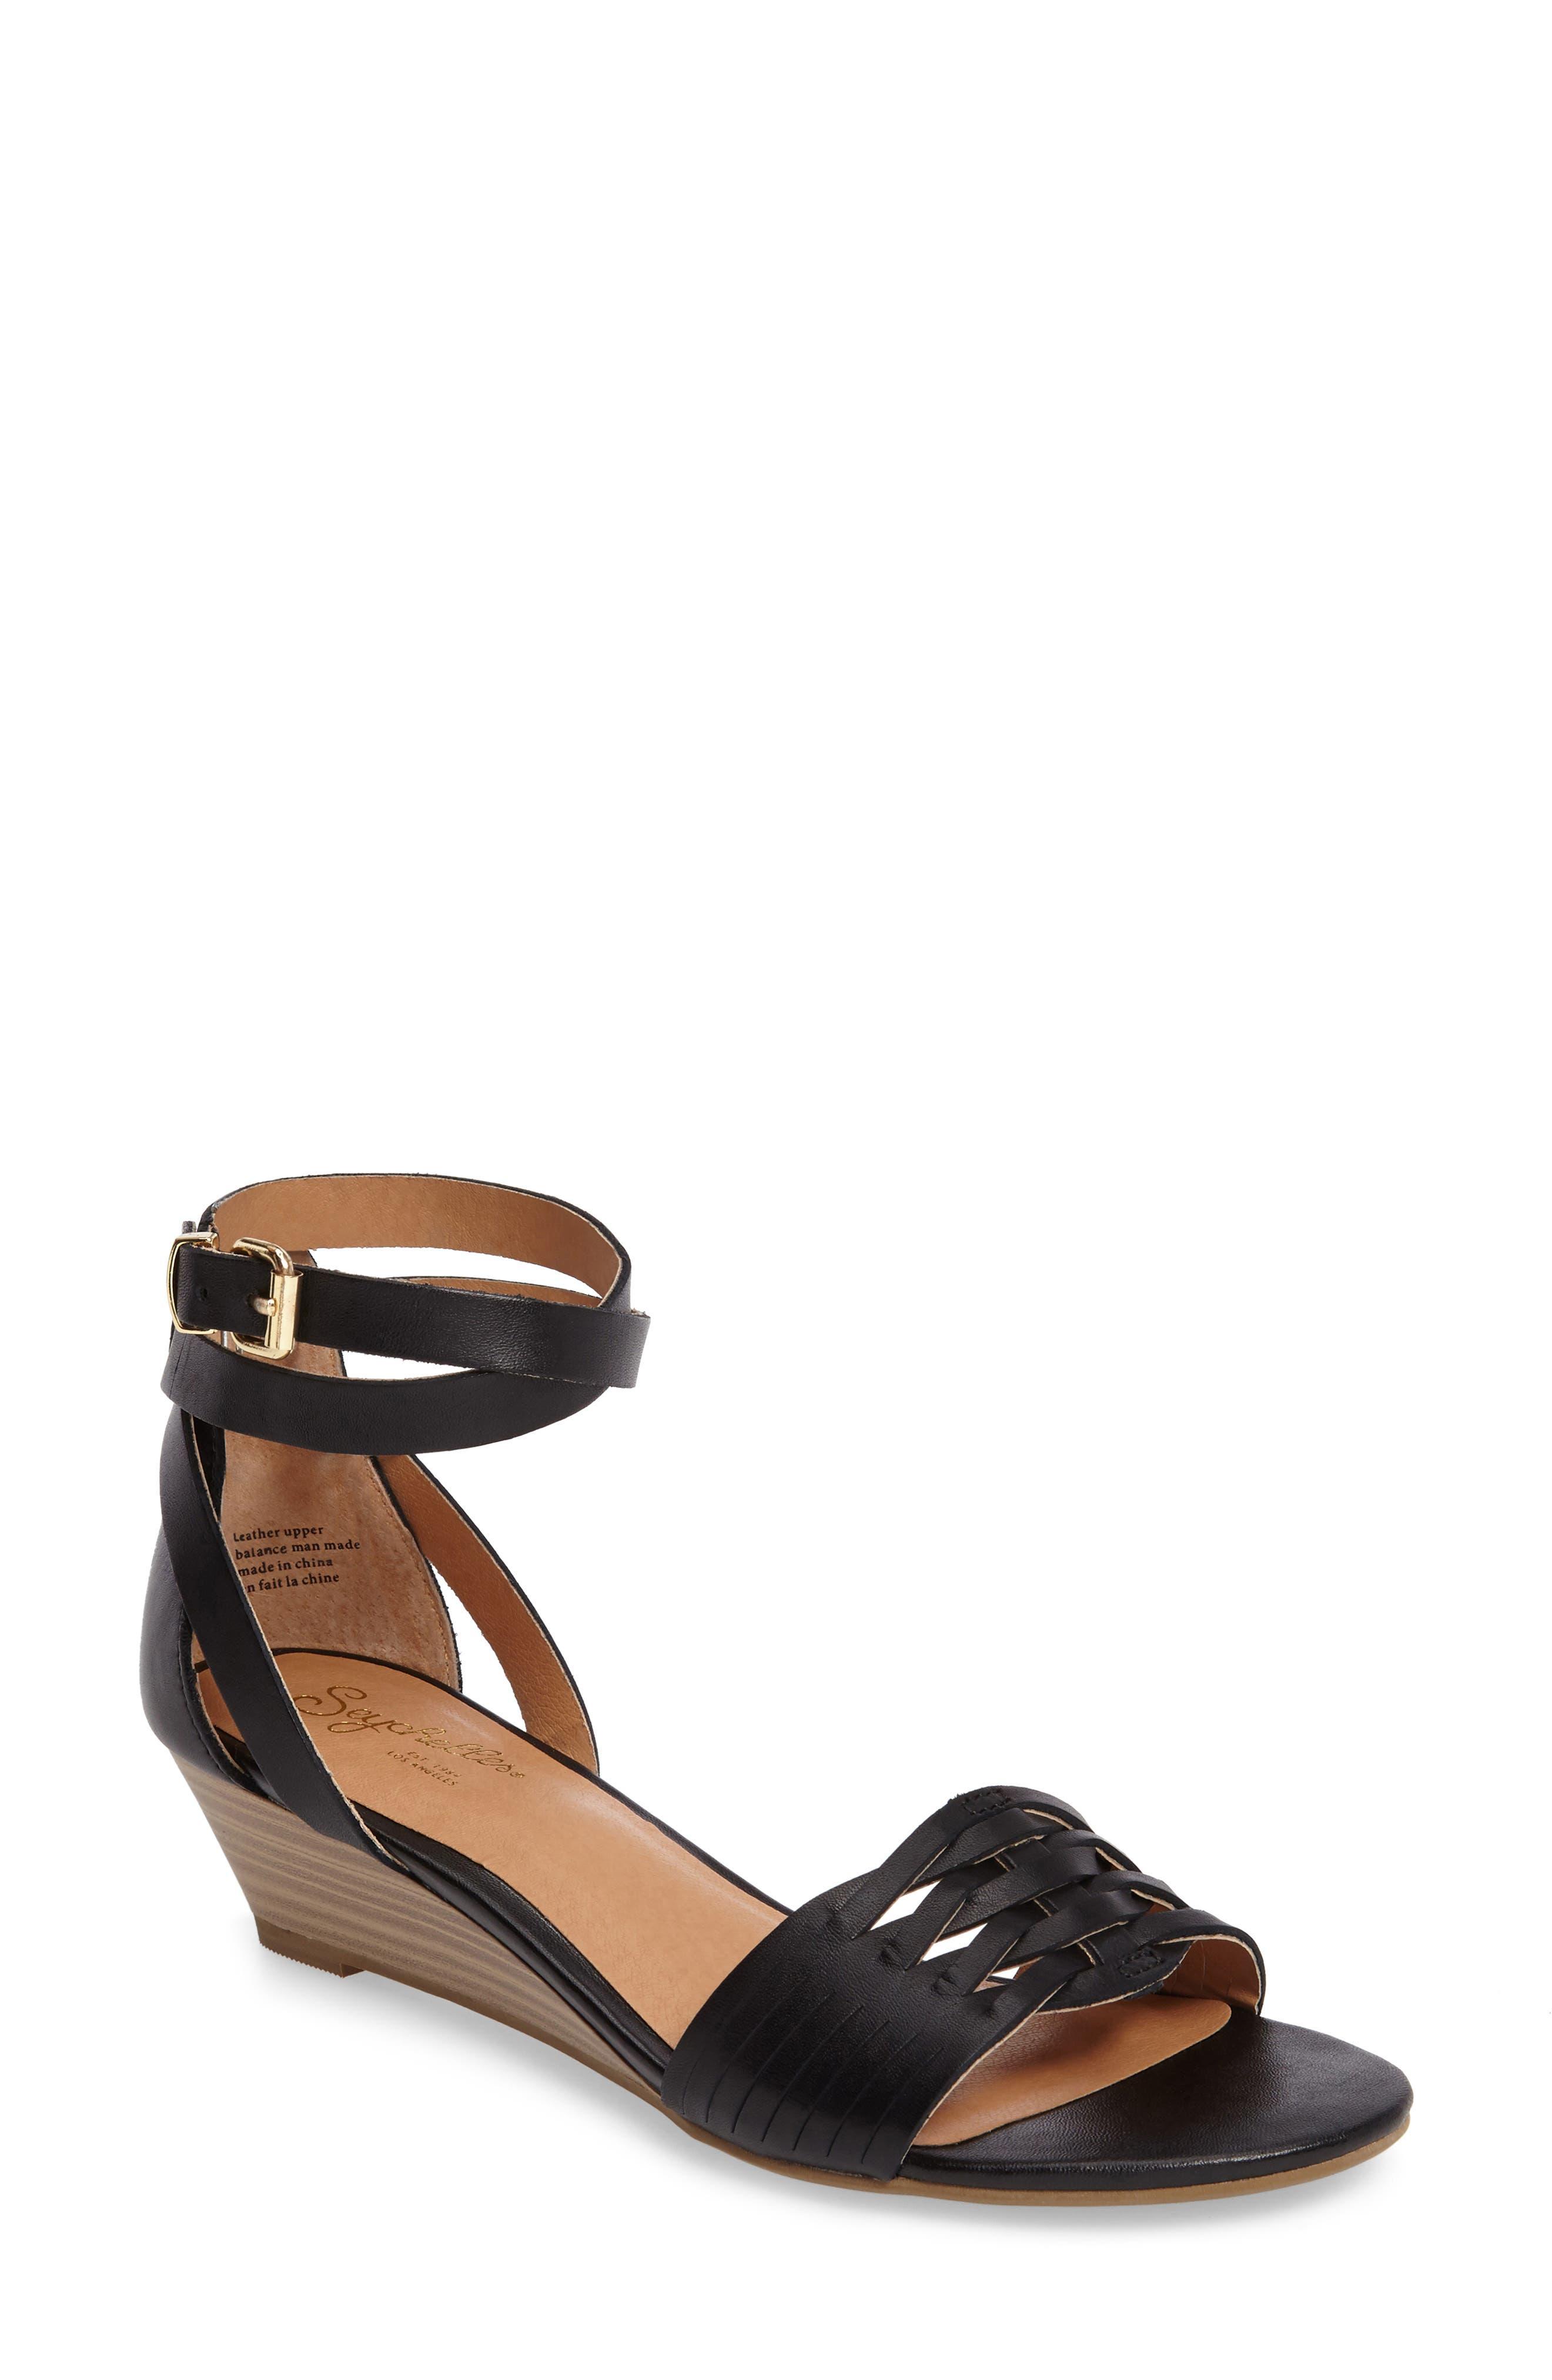 Sincere Wraparound Wedge Sandal, Main, color, 001